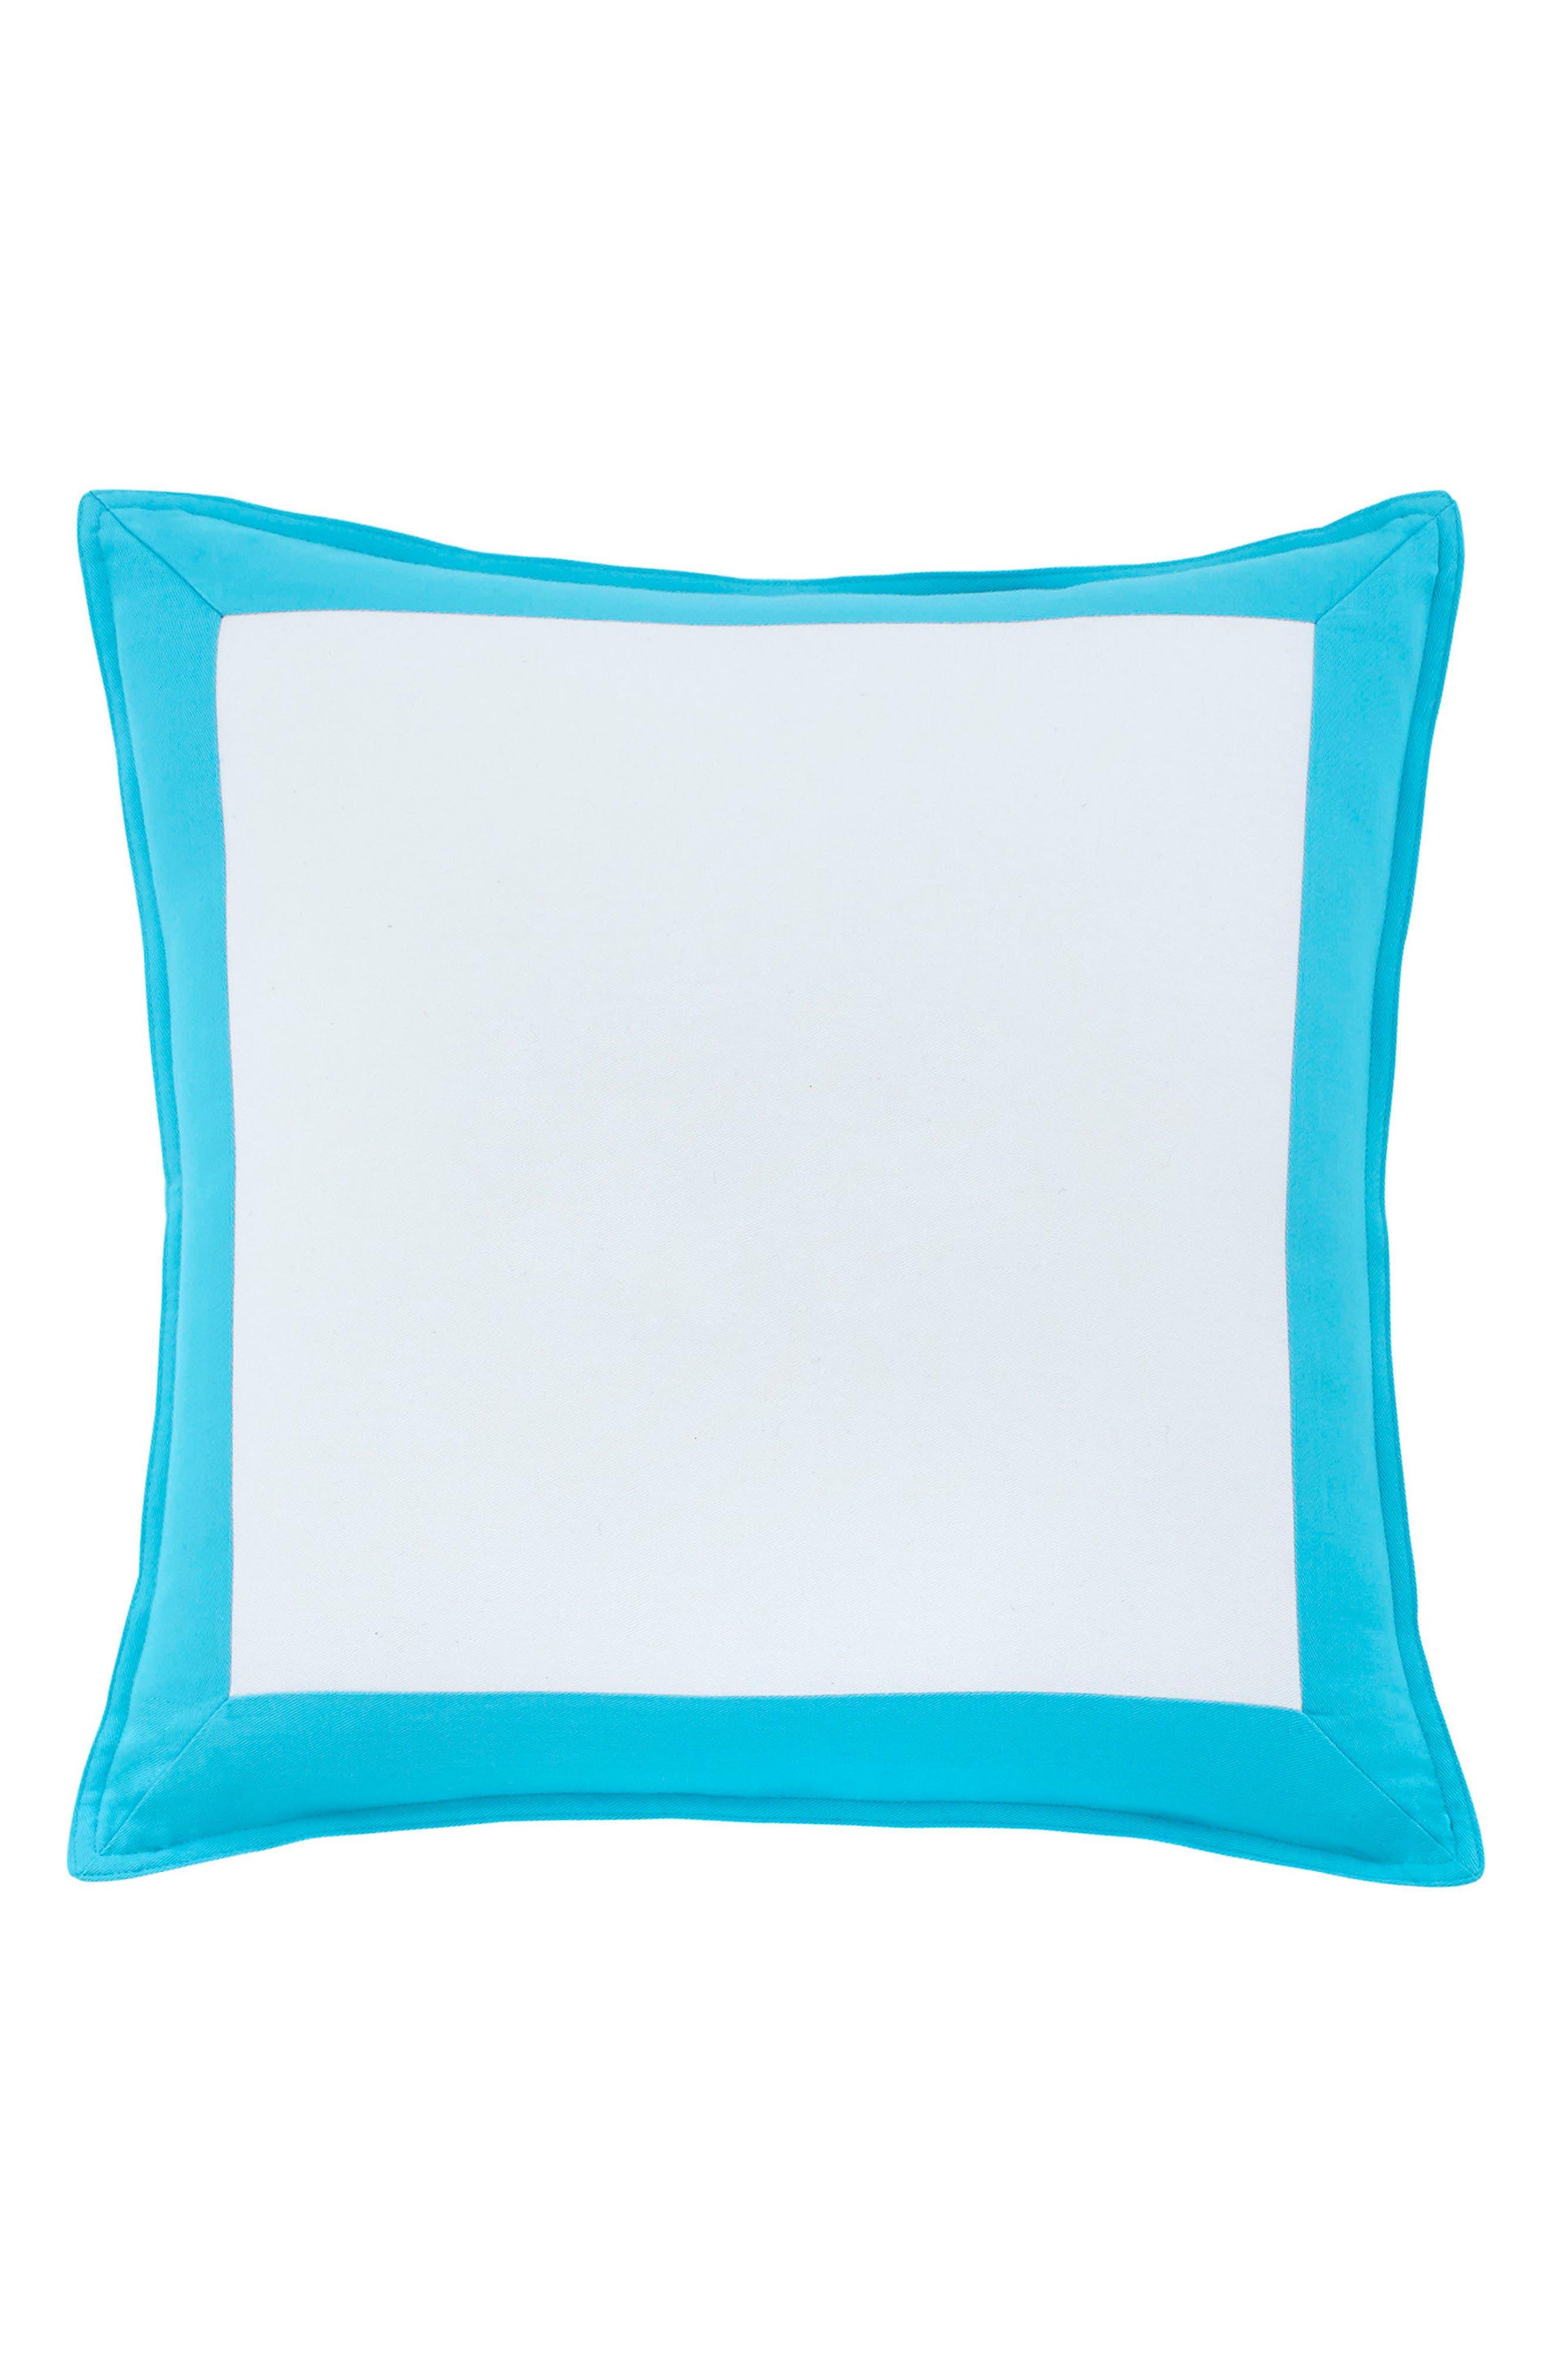 Skipjack Chino Accent Pillow,                             Main thumbnail 1, color,                             ISLAND BLUE